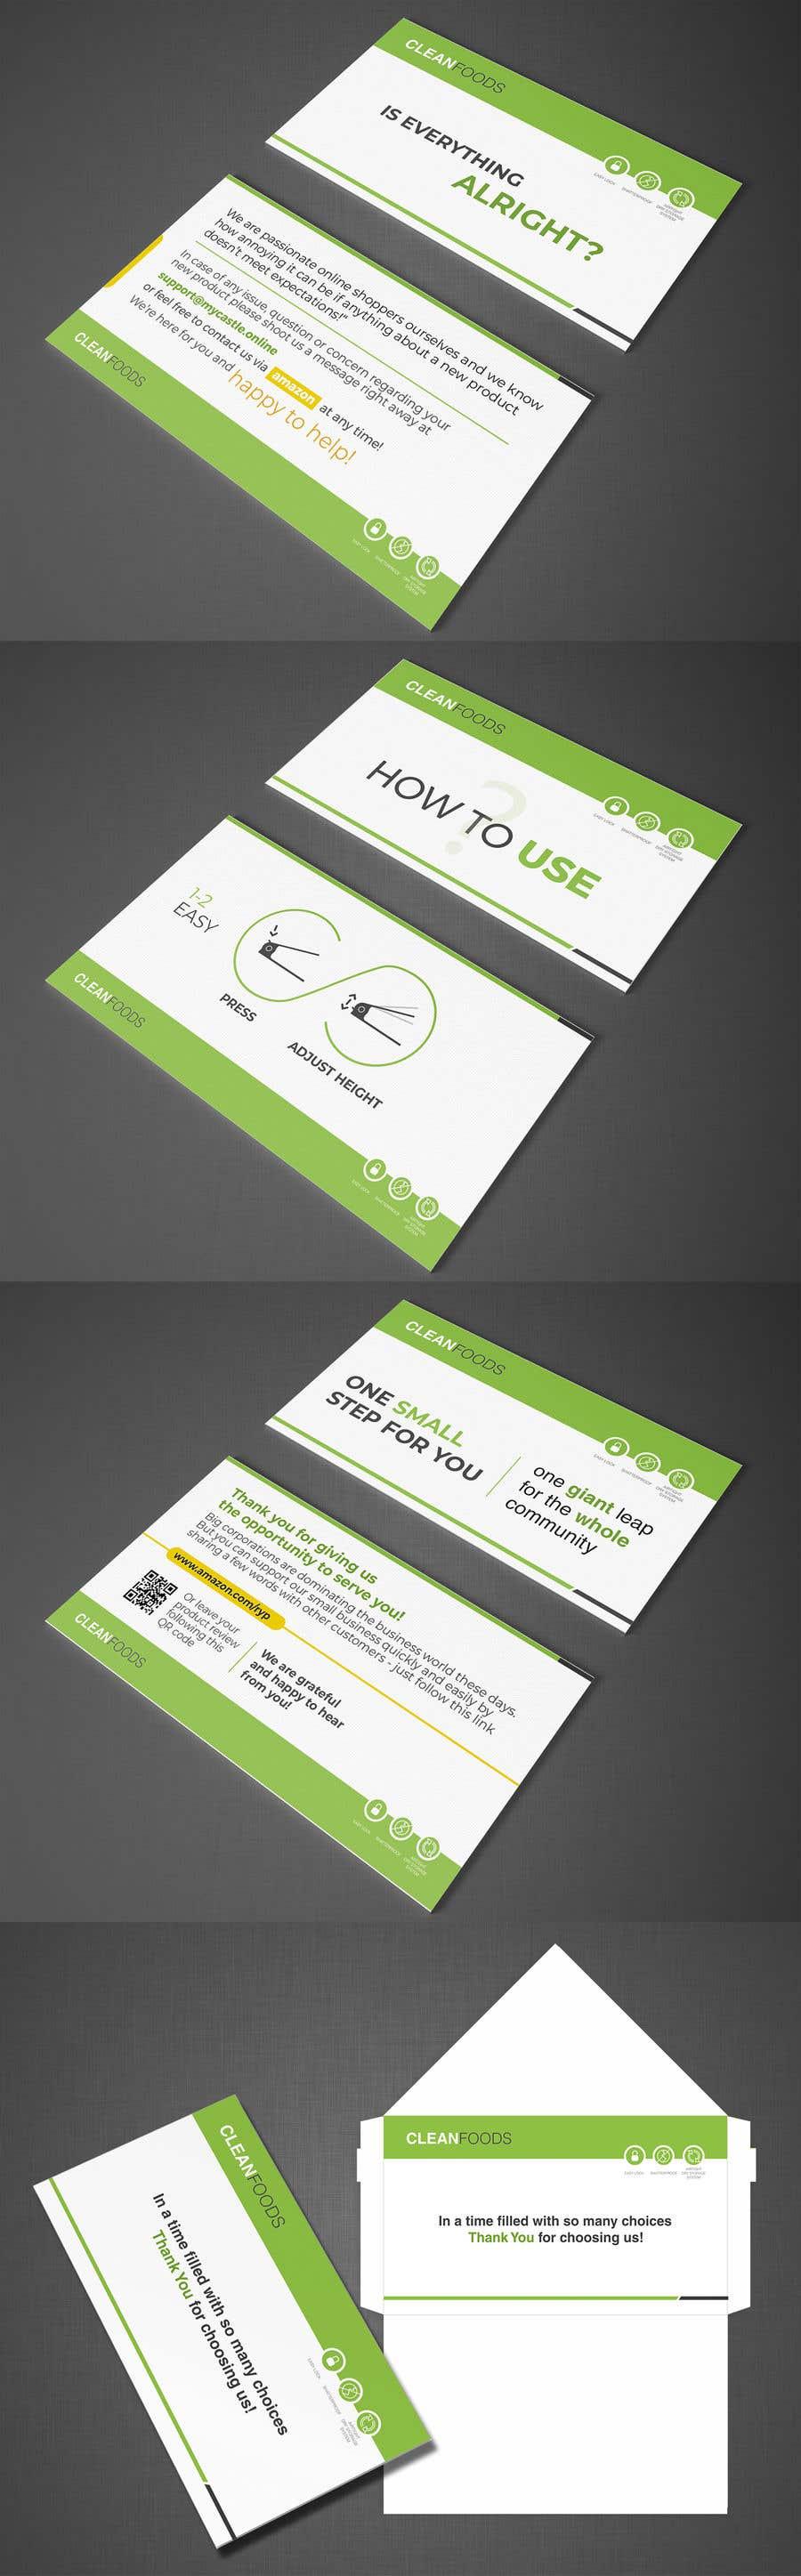 Participación en el concurso Nro.25 para 3x INSERT CARDS + ENVELOPE DESIGN needed for e-commerce packaging